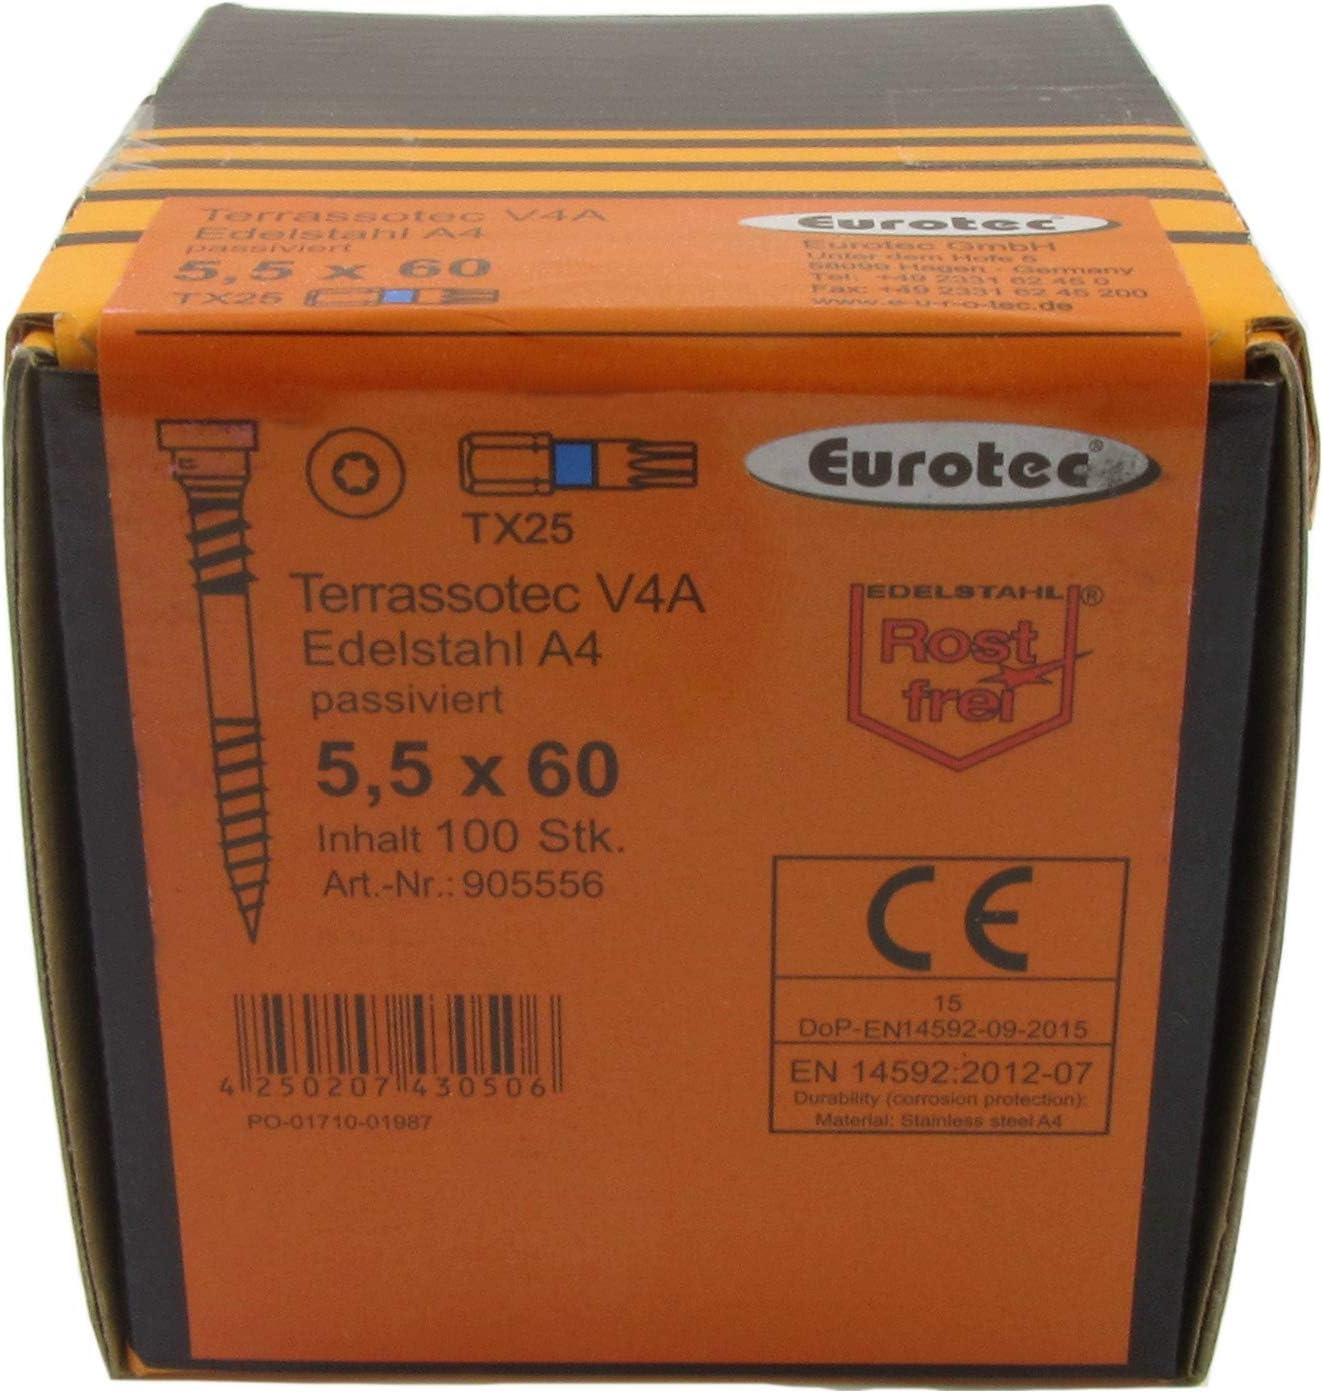 100 St/ück EUROTEC Terrassotec Trilobular V4A 5,5x90mm